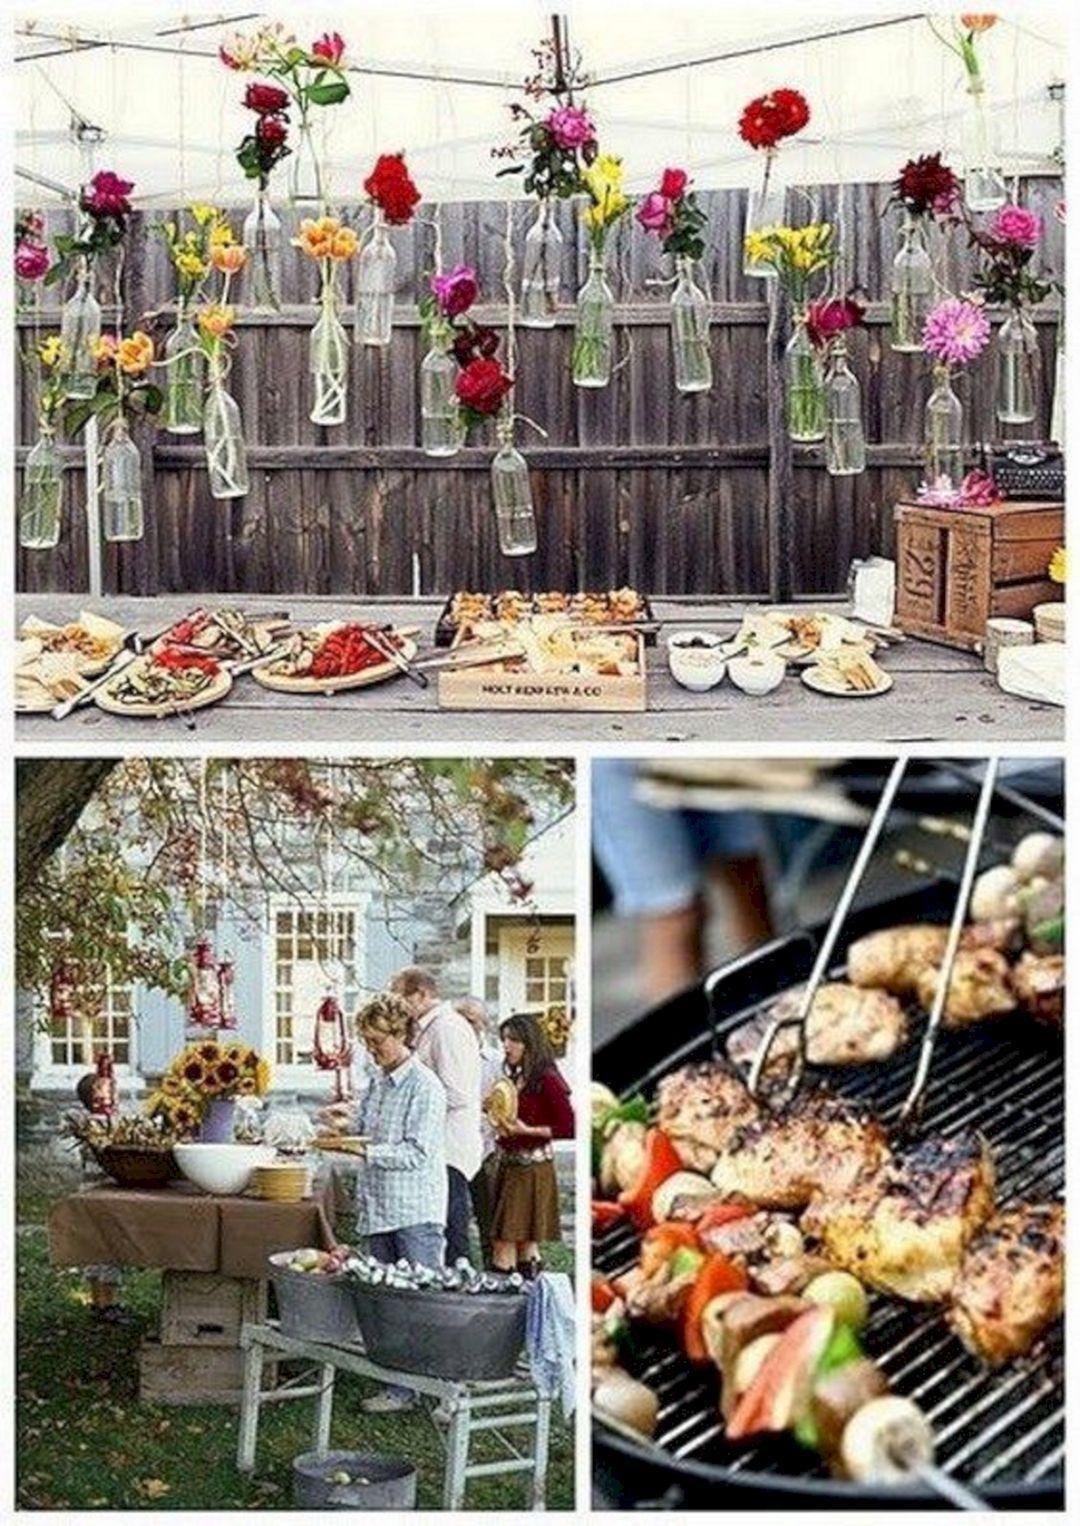 BBQ Reception Ideas 26 | Mariage barbecue, Repas mariage et Idées barbecue